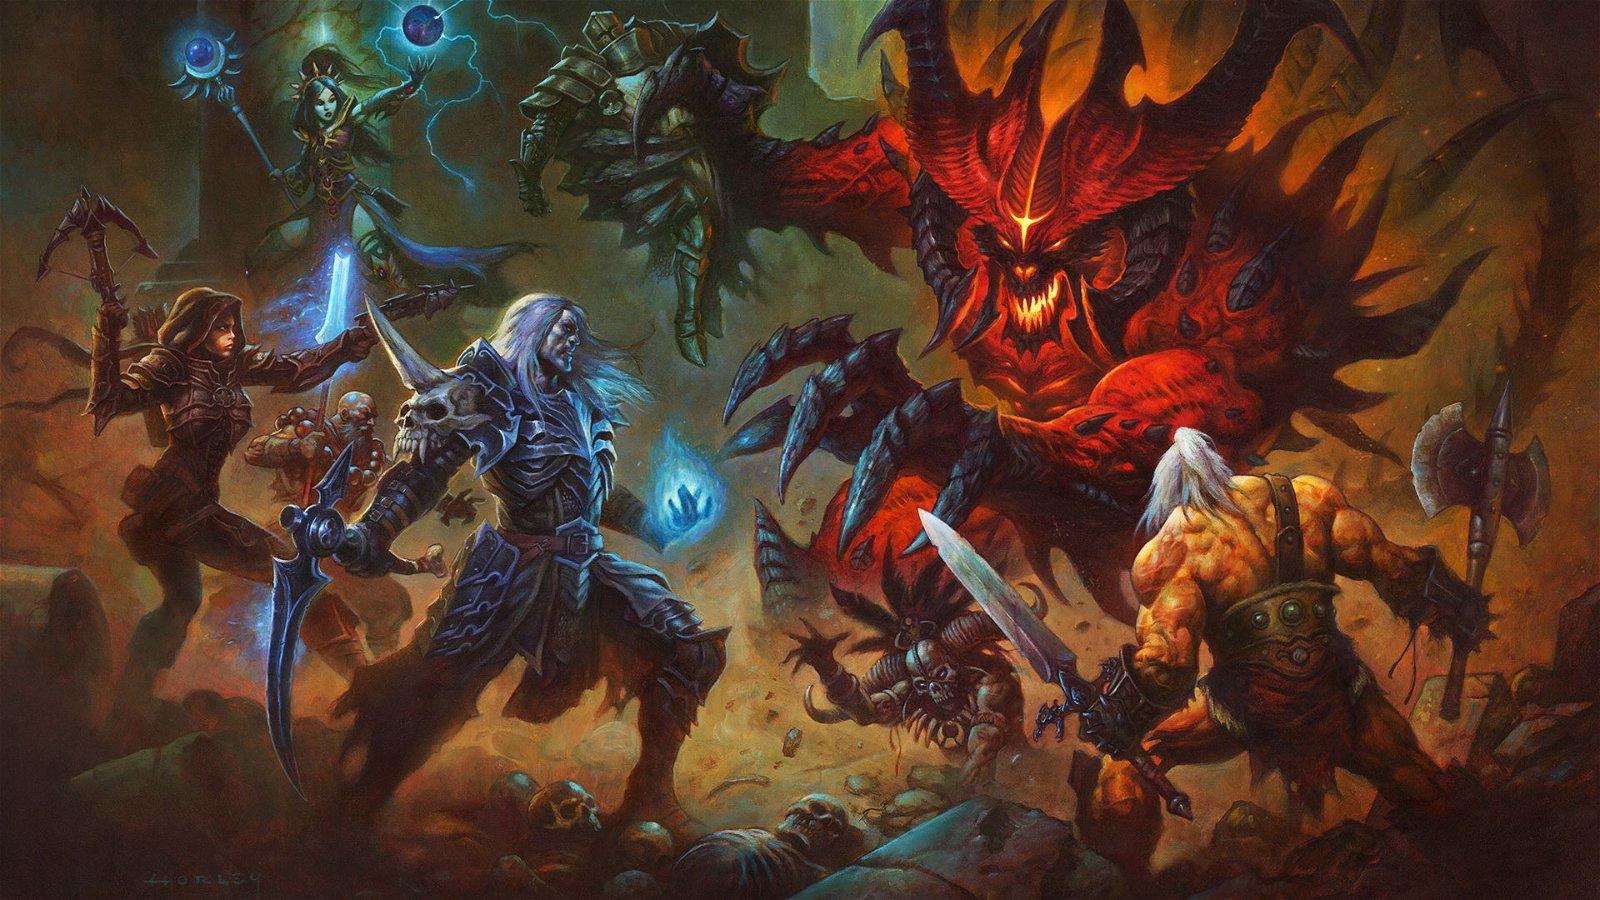 Diablo III: Rise of the Necromancer Review